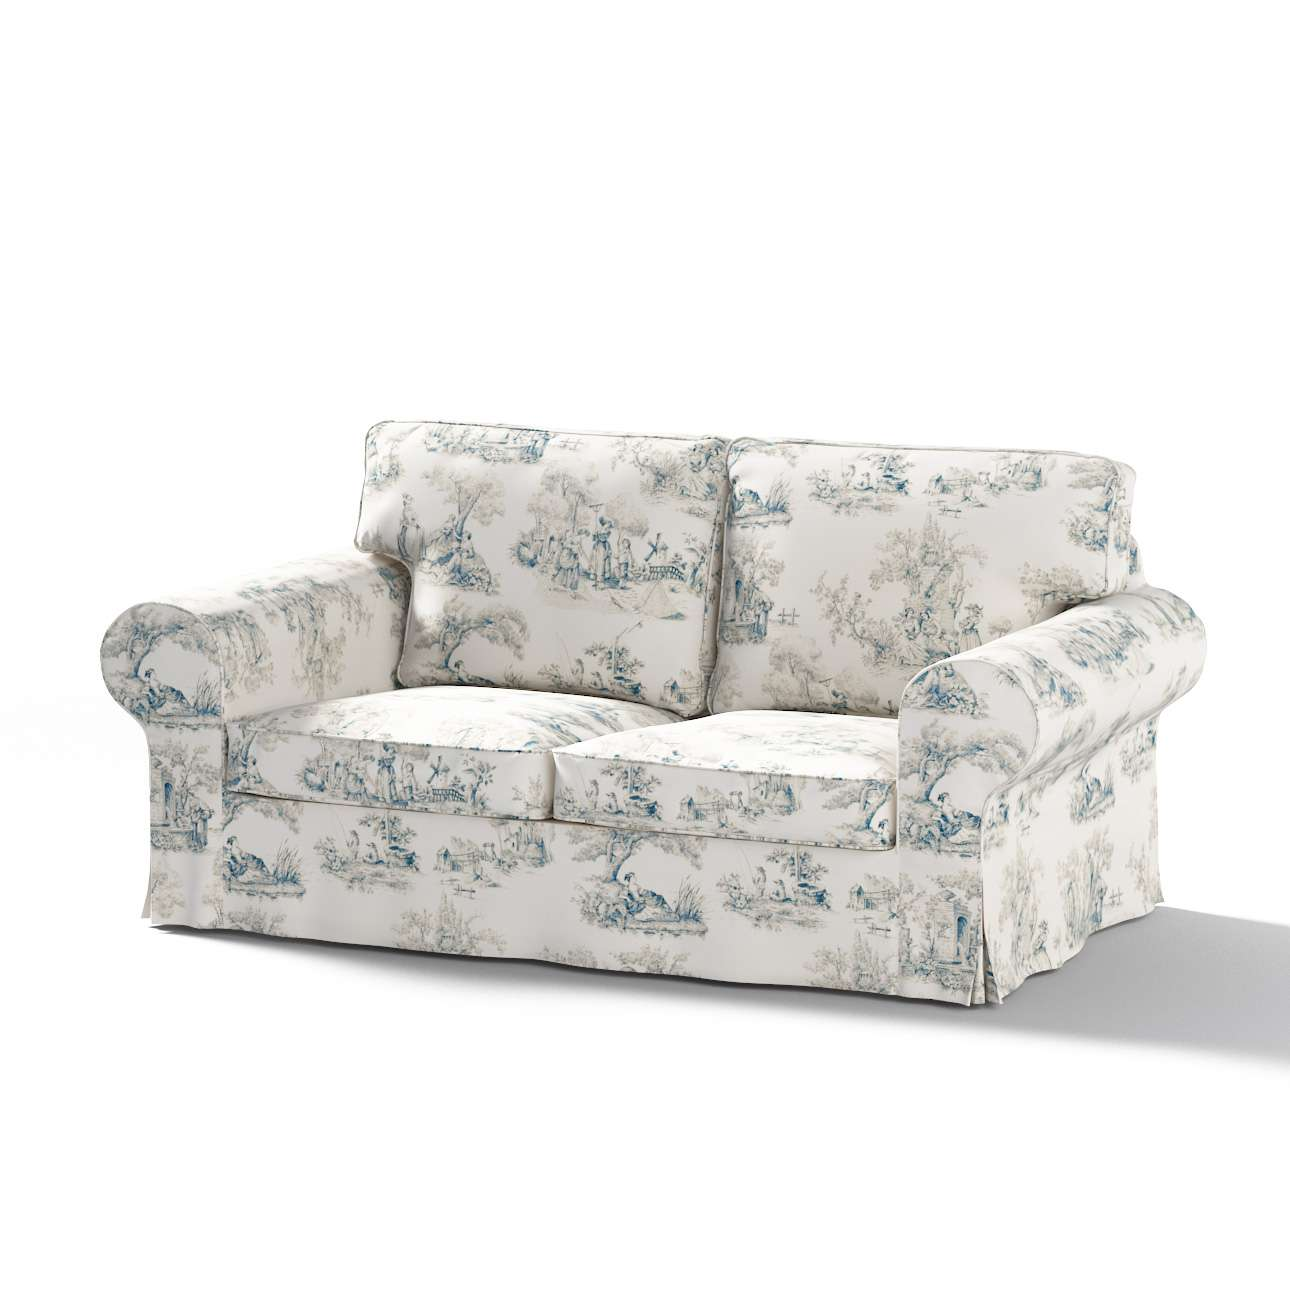 Fantastic Ektorp 2 Seater Sofa Bed Cover For Model On Sale In Ikea 2004 2011 Frankydiablos Diy Chair Ideas Frankydiabloscom